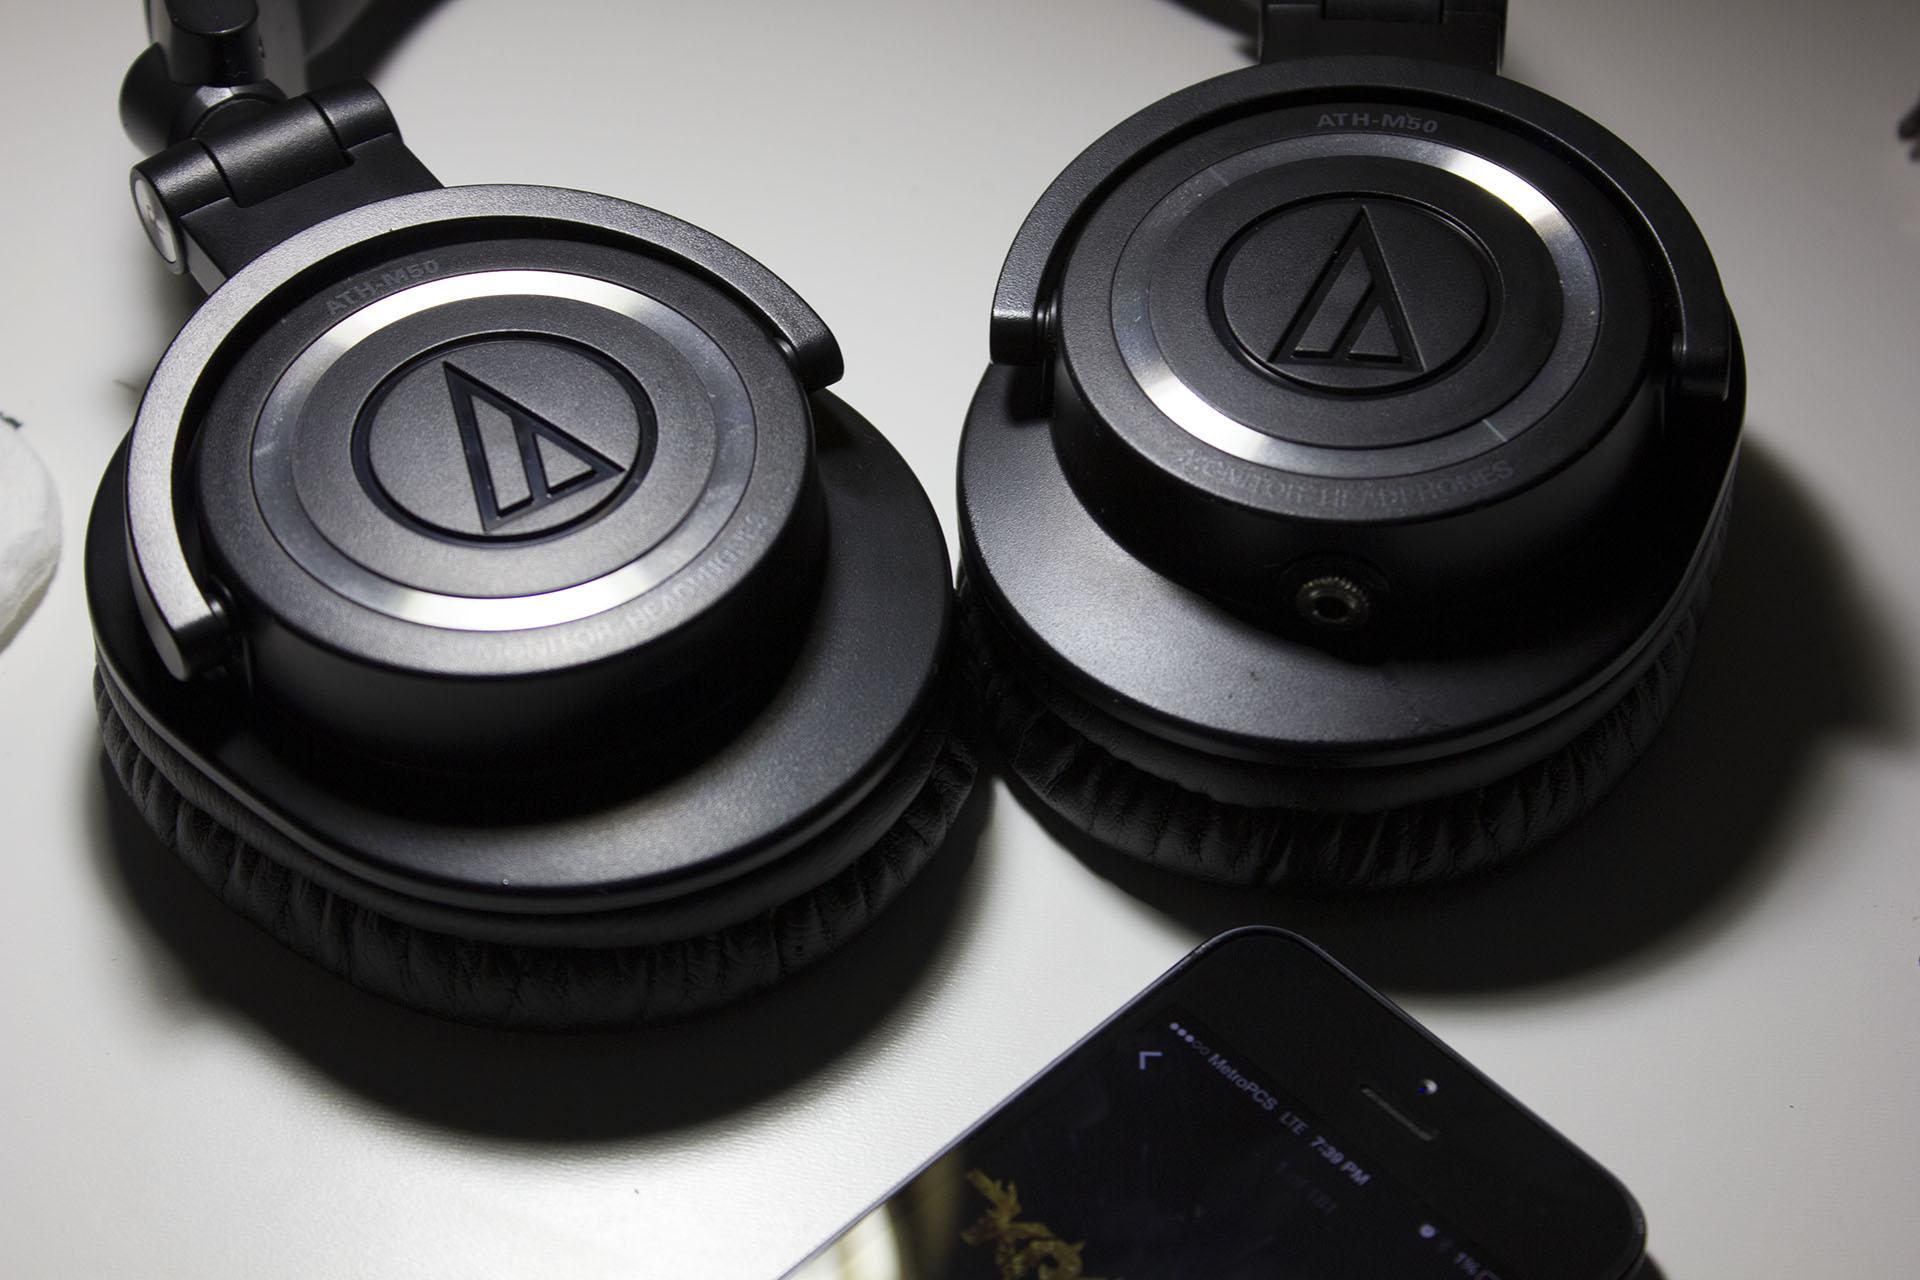 Audio Technica ATH M50s removable cable mod